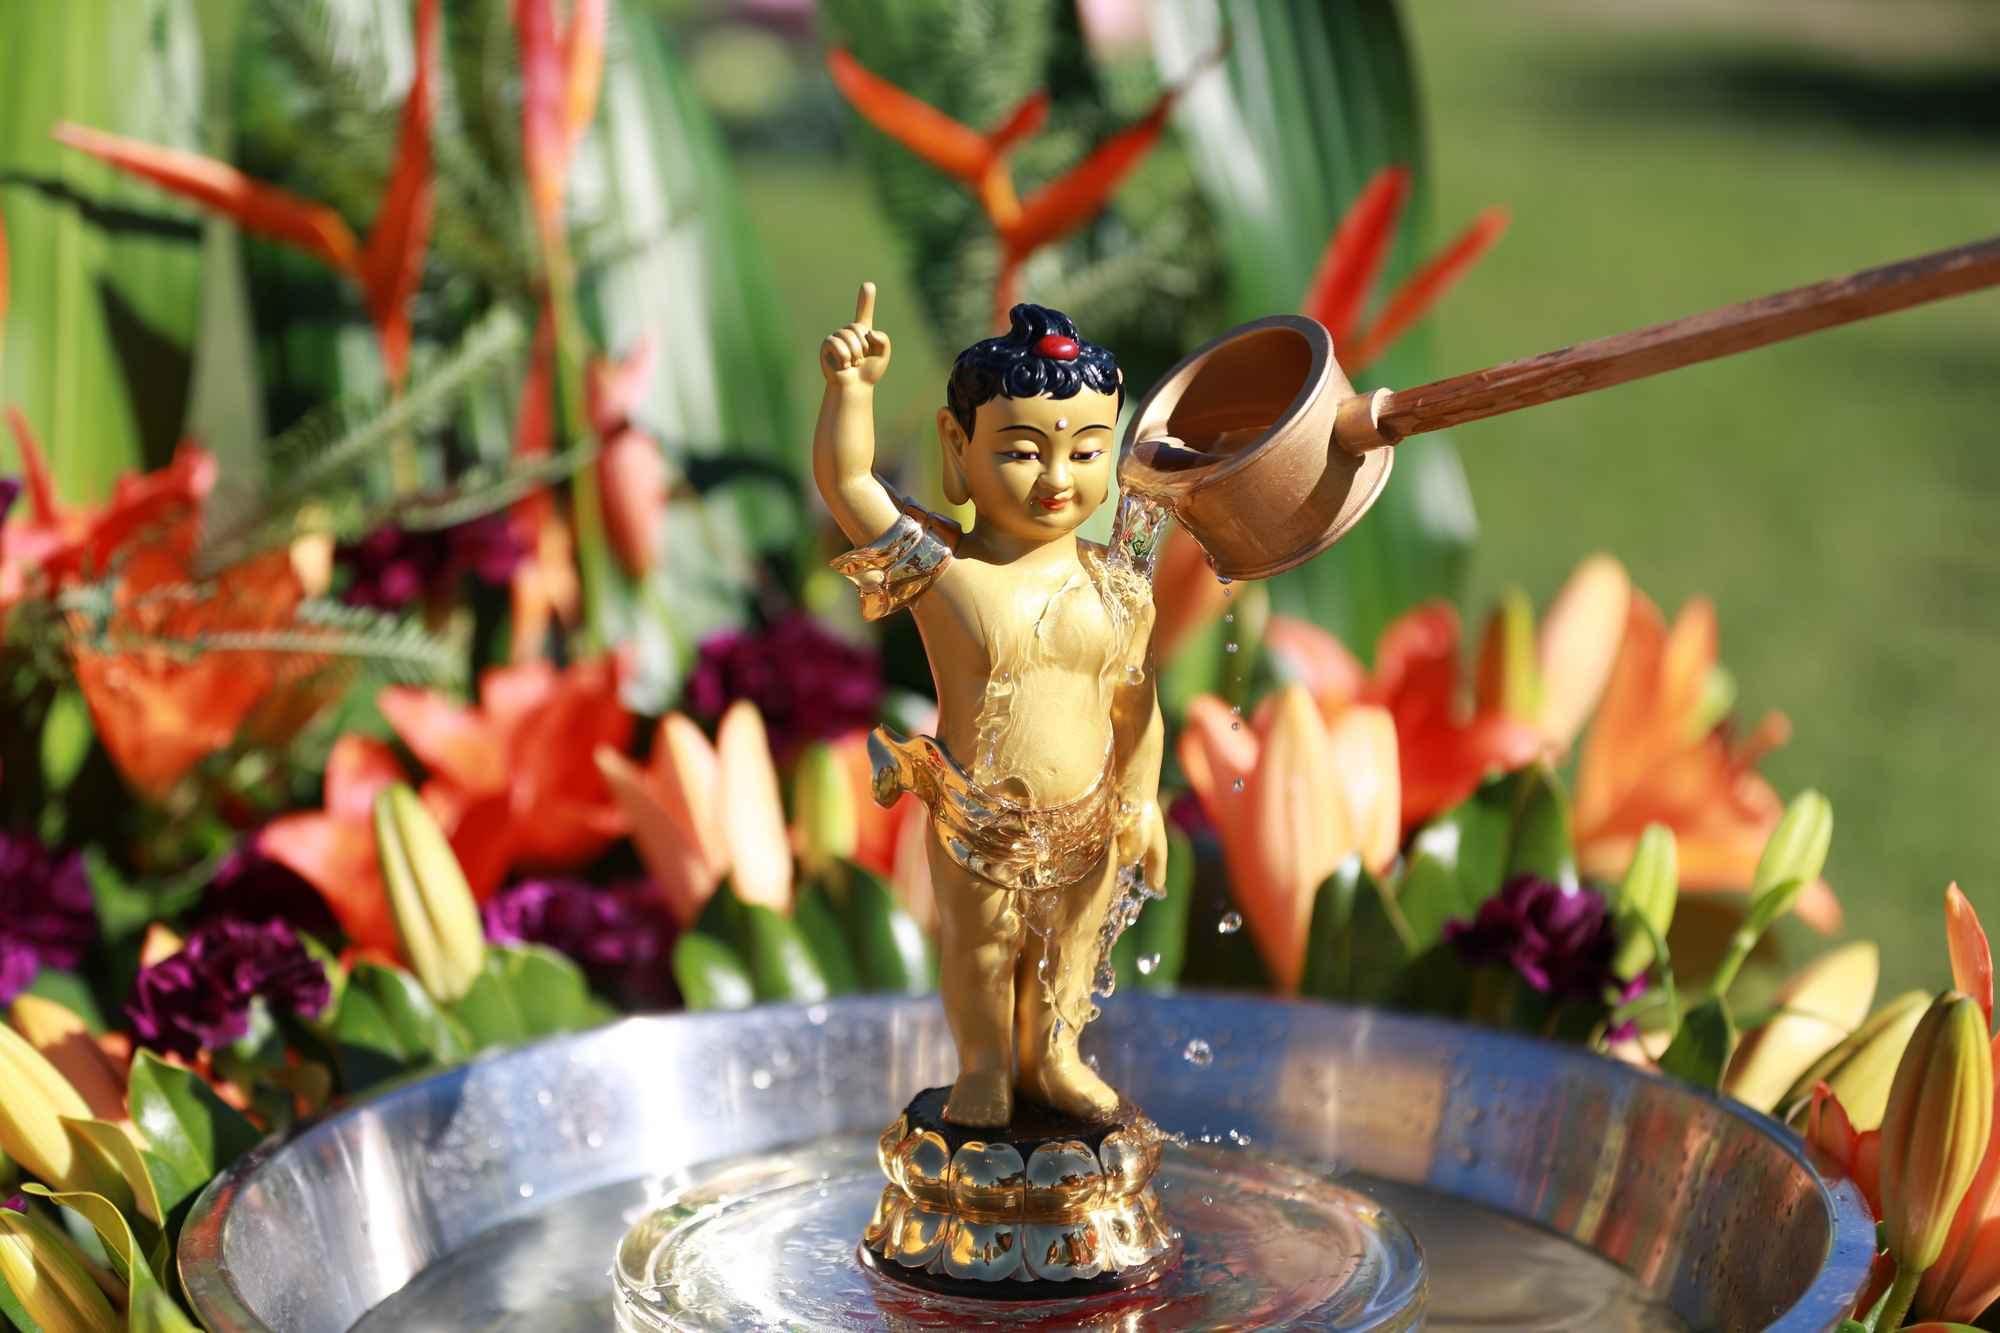 About-Buddhas-birthday